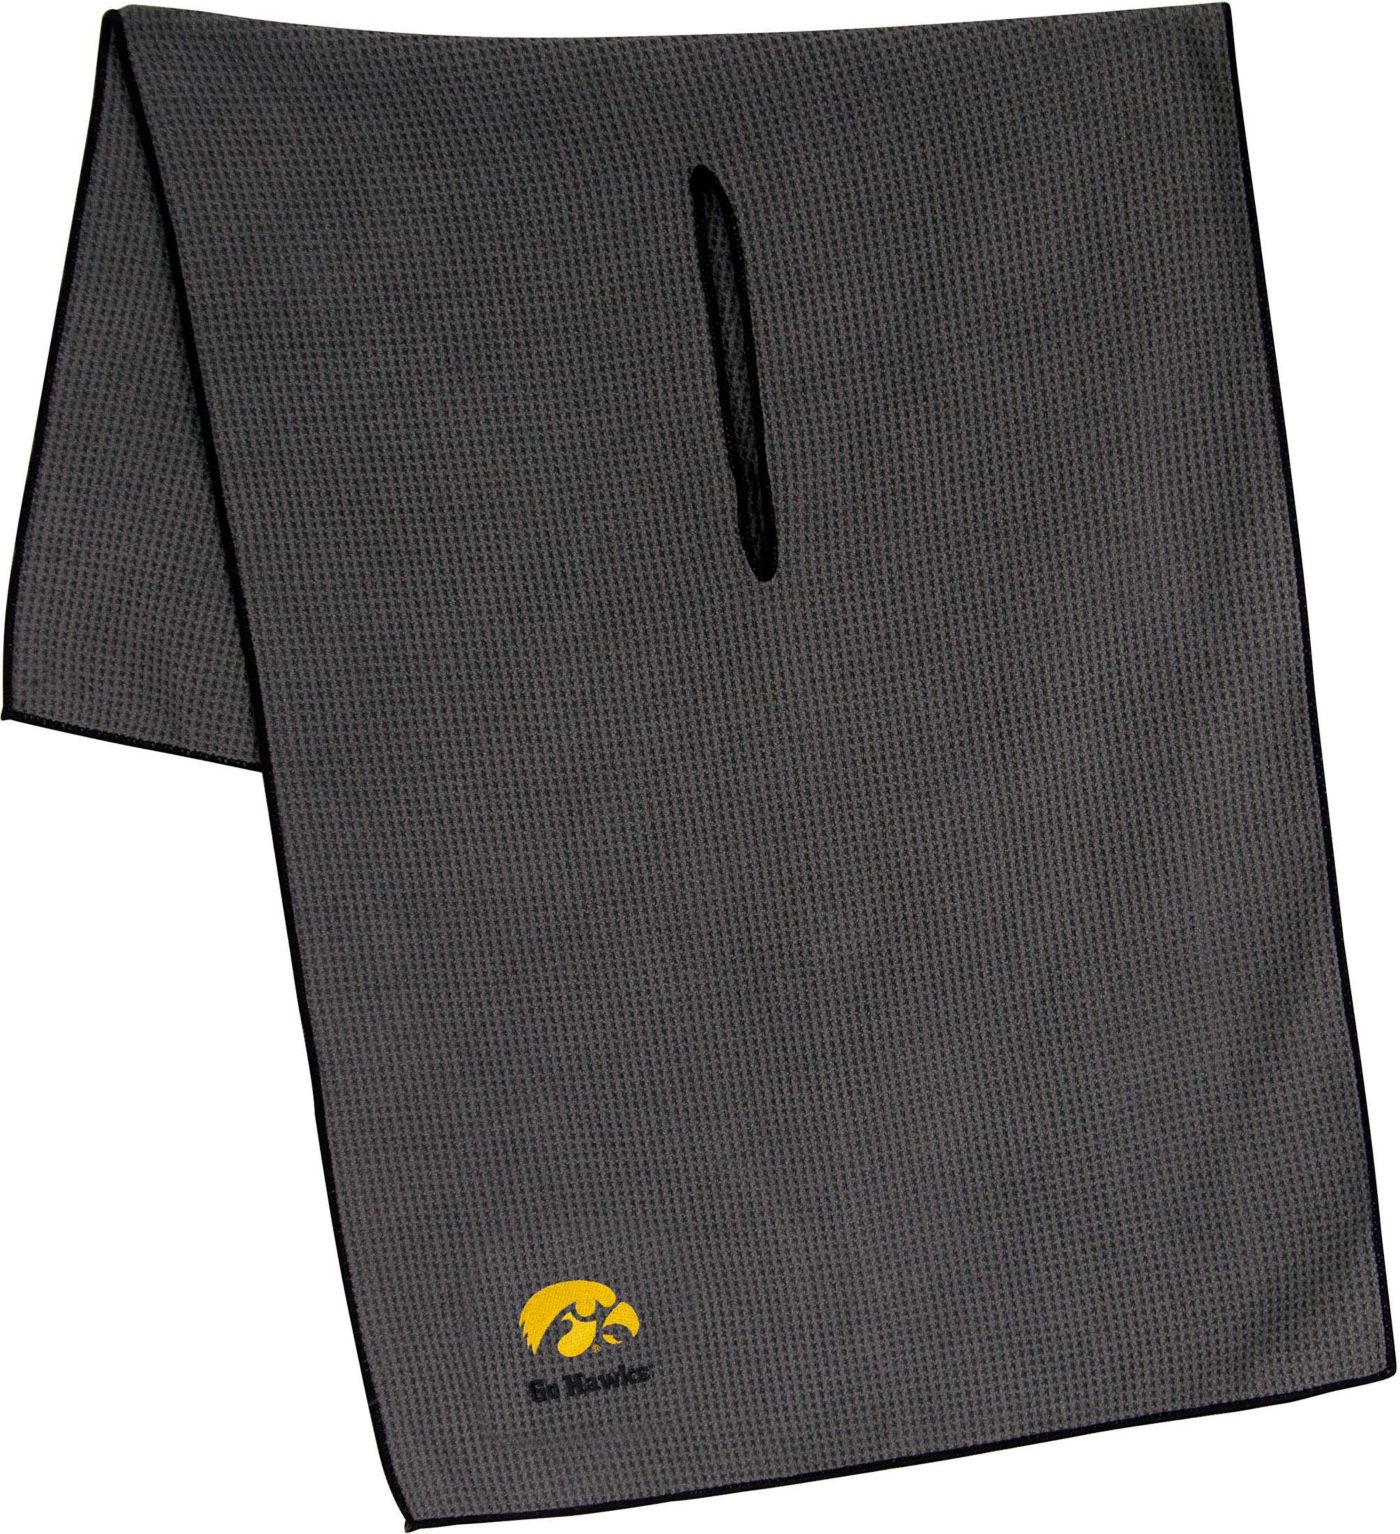 "Team Effort Iowa Hawkeyes 19"" x 41"" Microfiber Golf Towel"